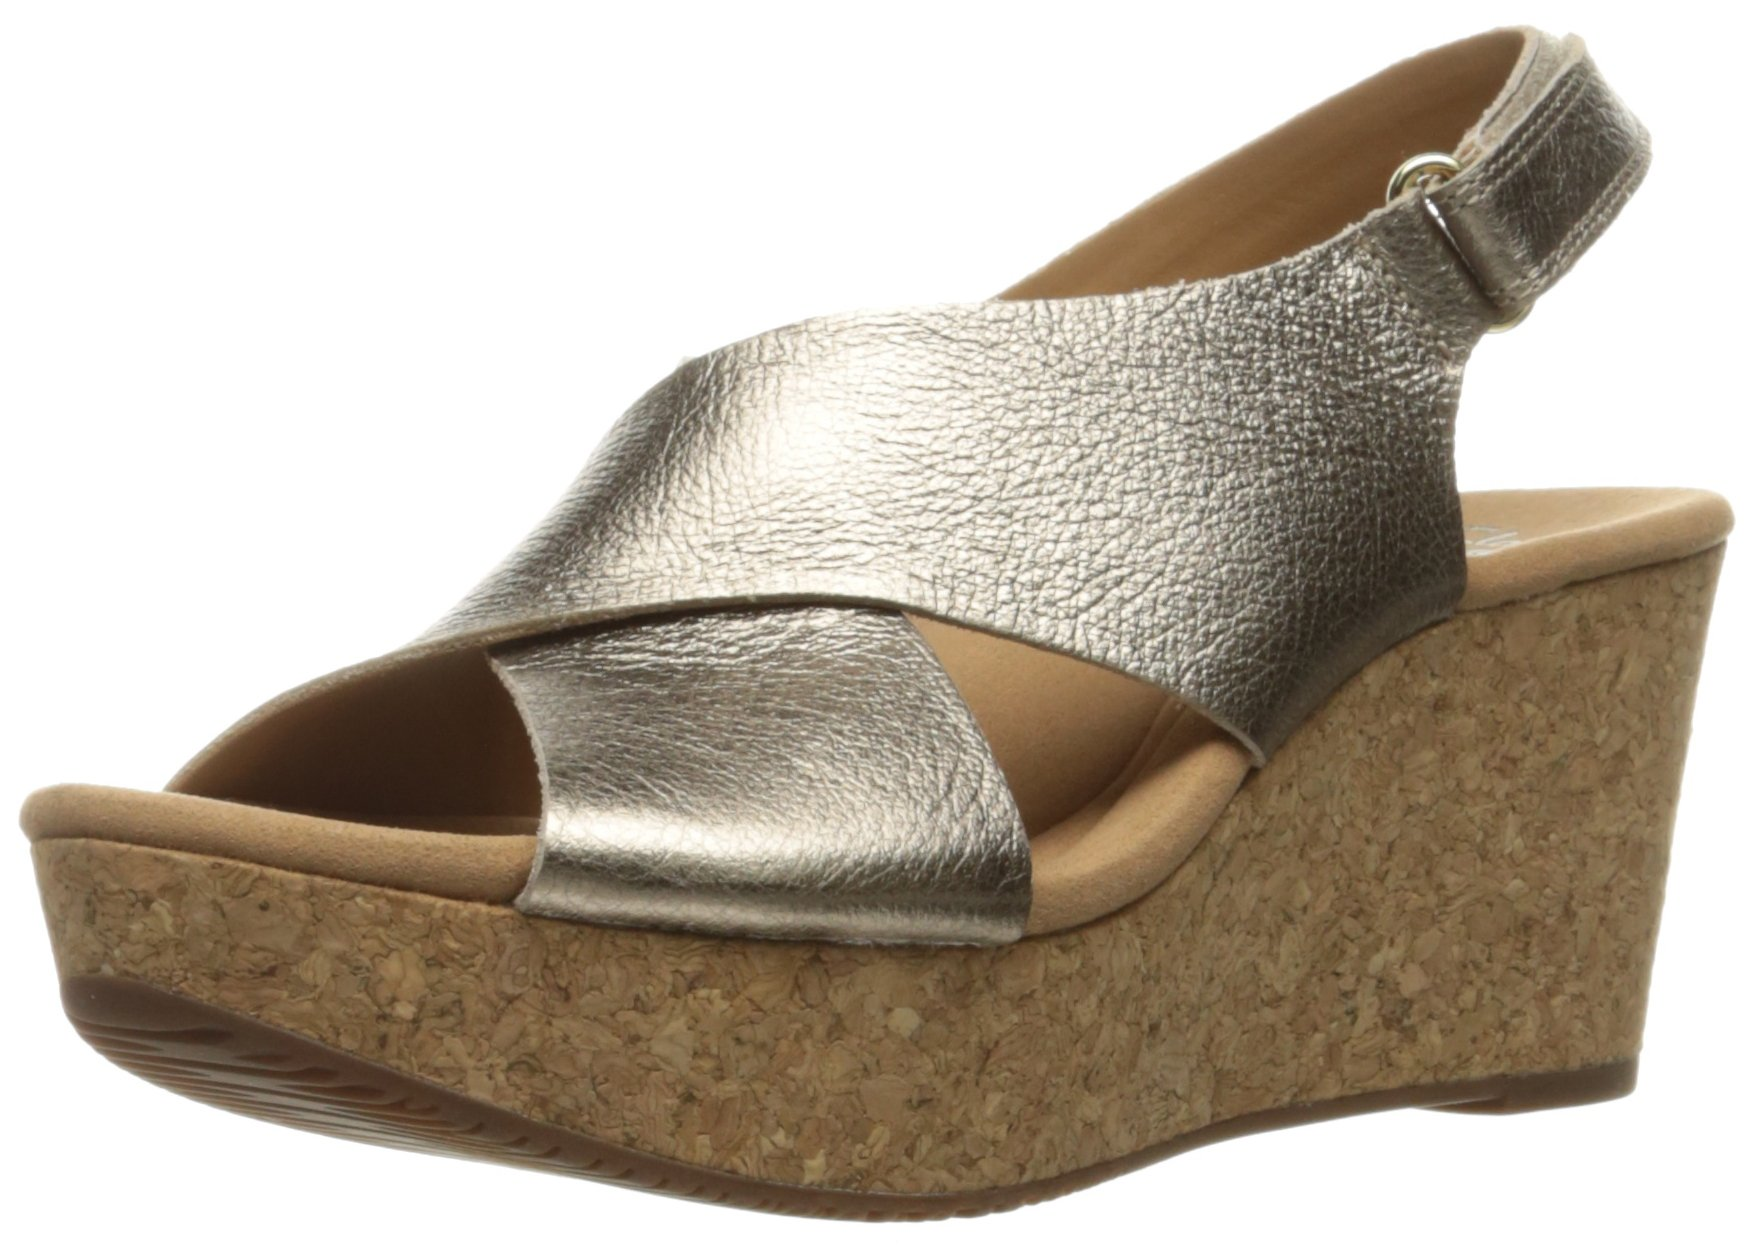 CLARKS Women's Annadel Eirwyn Wedge Sandal, Gold/Metallic, 8.5 M US